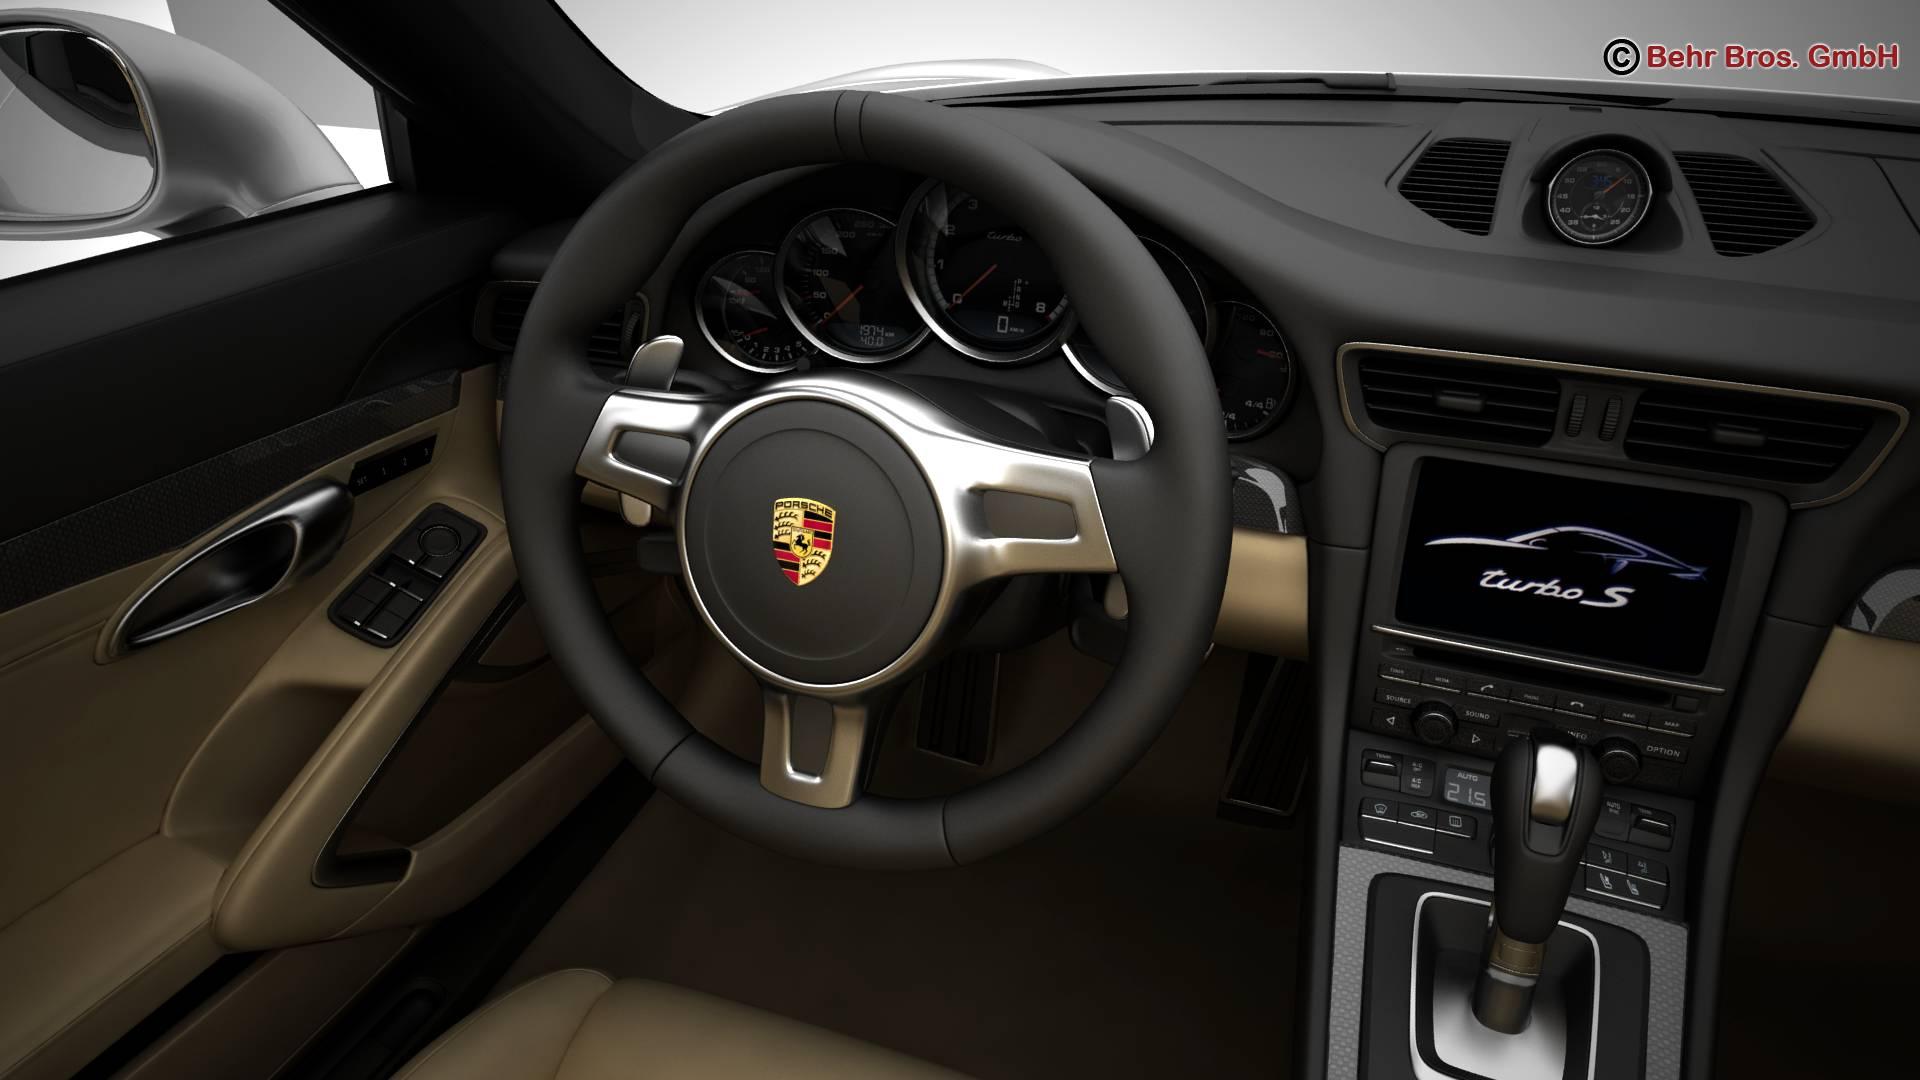 porsche 911 turbo s 2014 3d model 3ds max fbx c4d lwo ma mb obj 212489